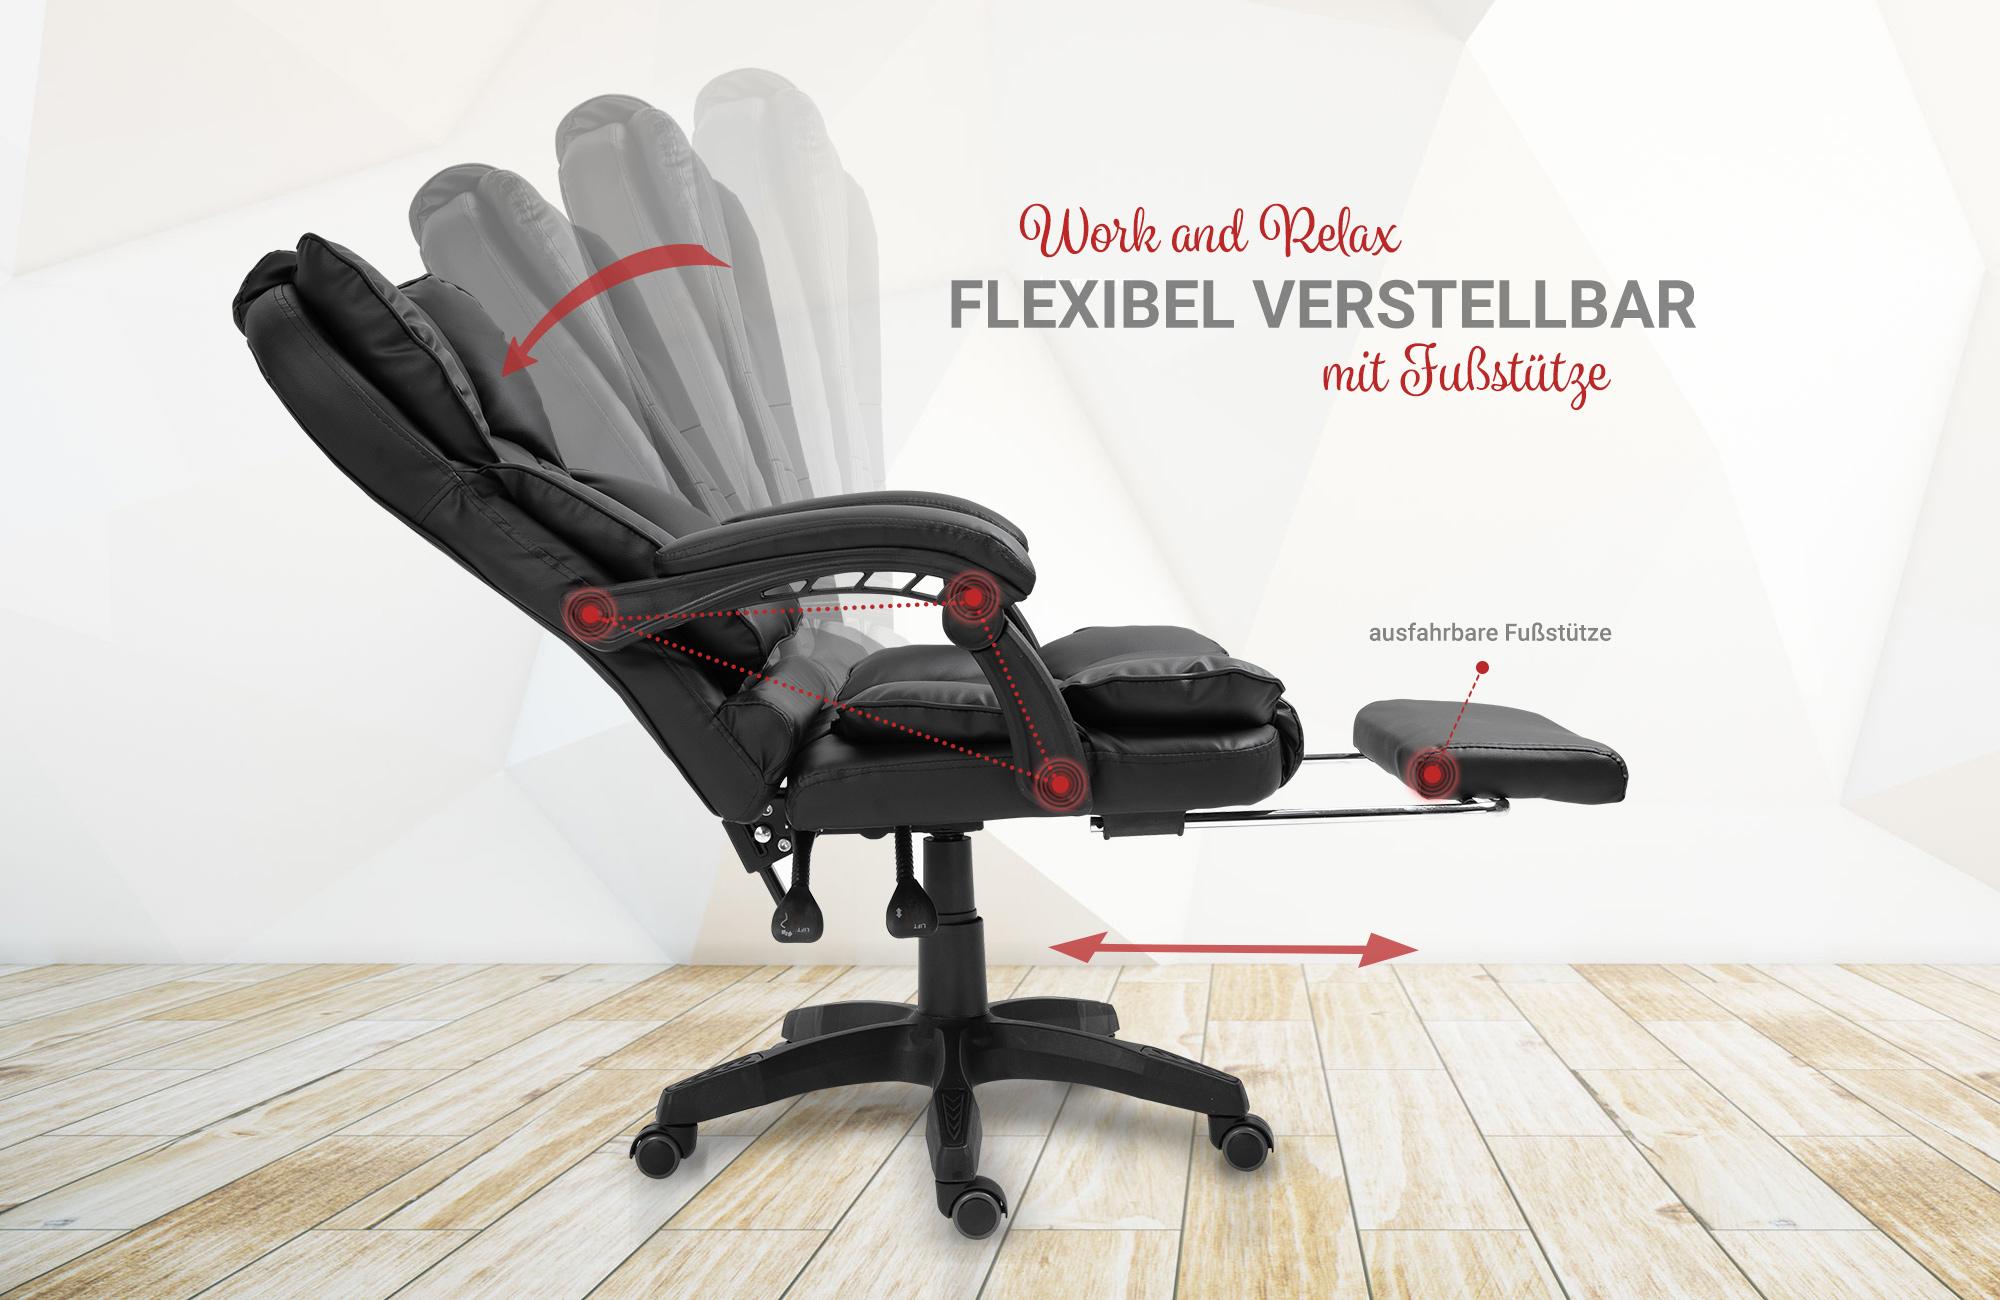 Details zu Bürostuhl Schreibtischstuhl Design TV Sessel Chefsessel Relax & Home Office